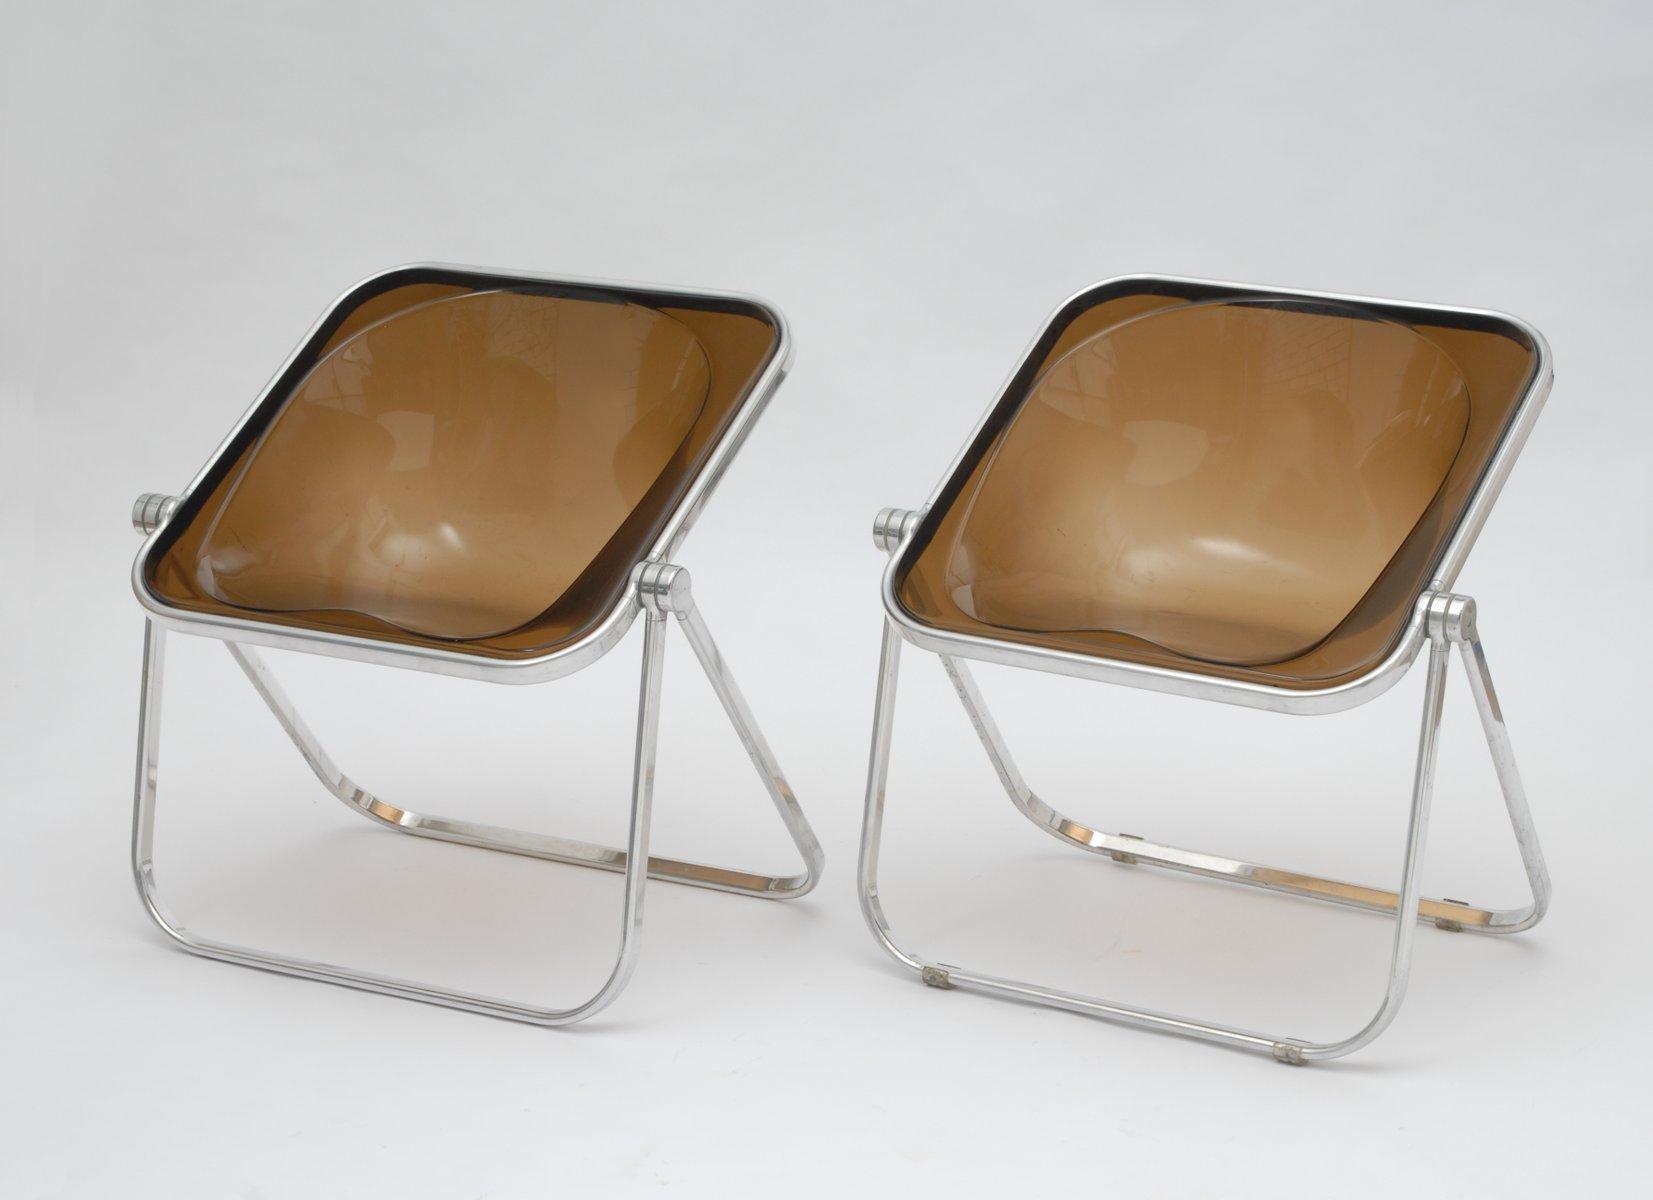 braune plone lounge st hle von giancarlo piretti f r. Black Bedroom Furniture Sets. Home Design Ideas